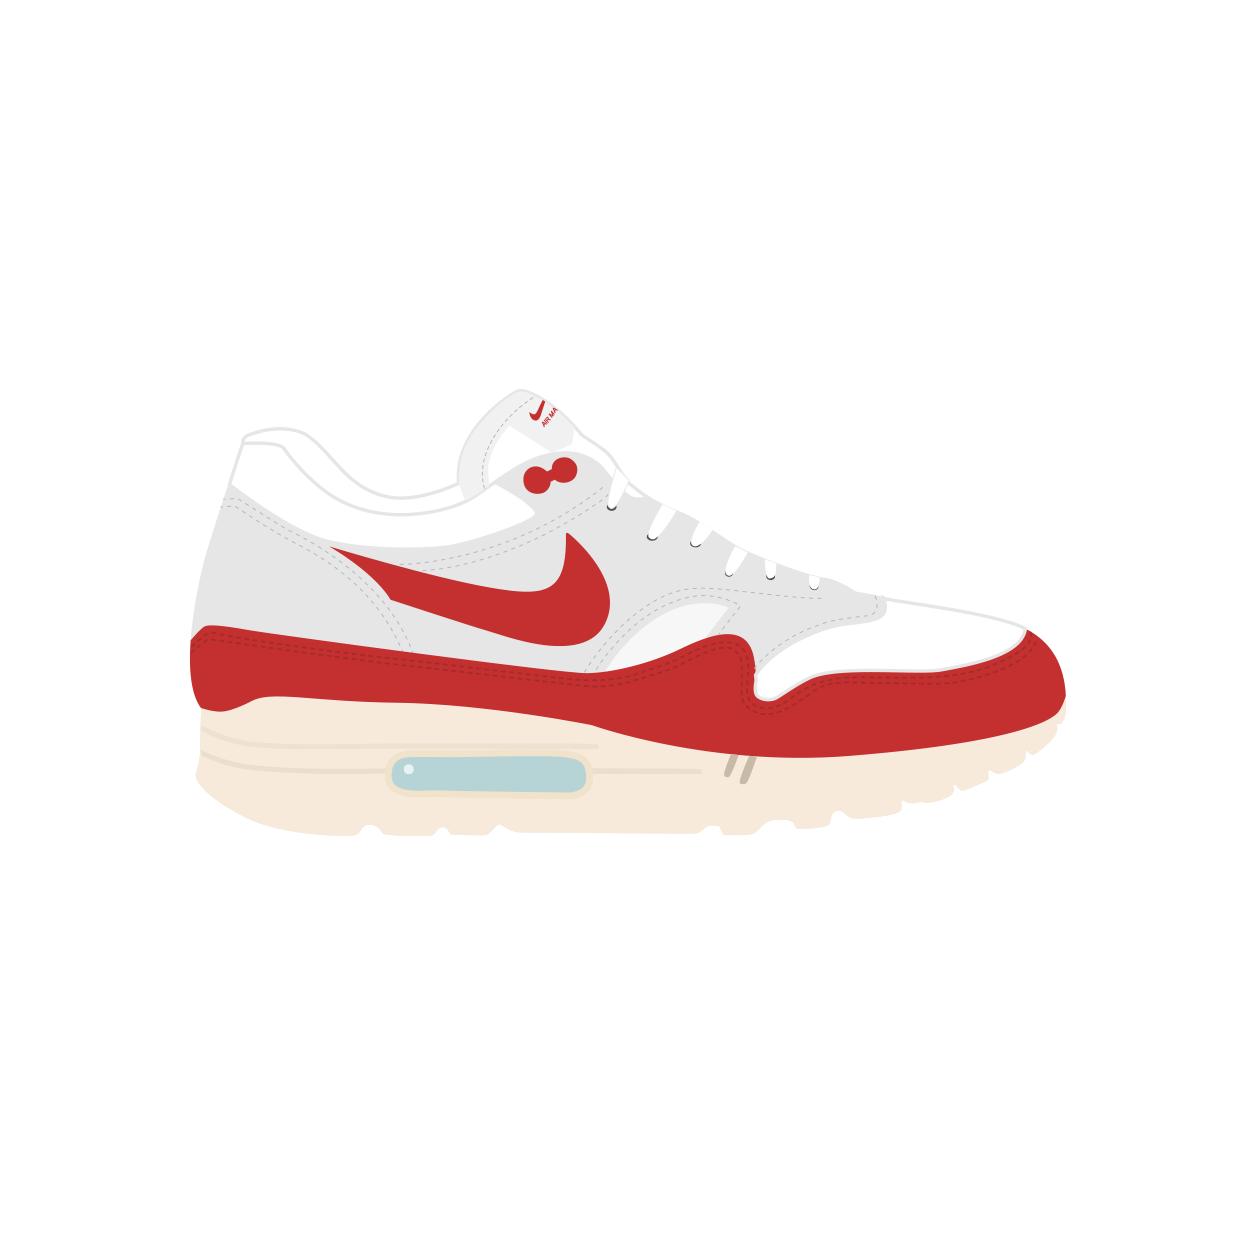 Sneakers Delight